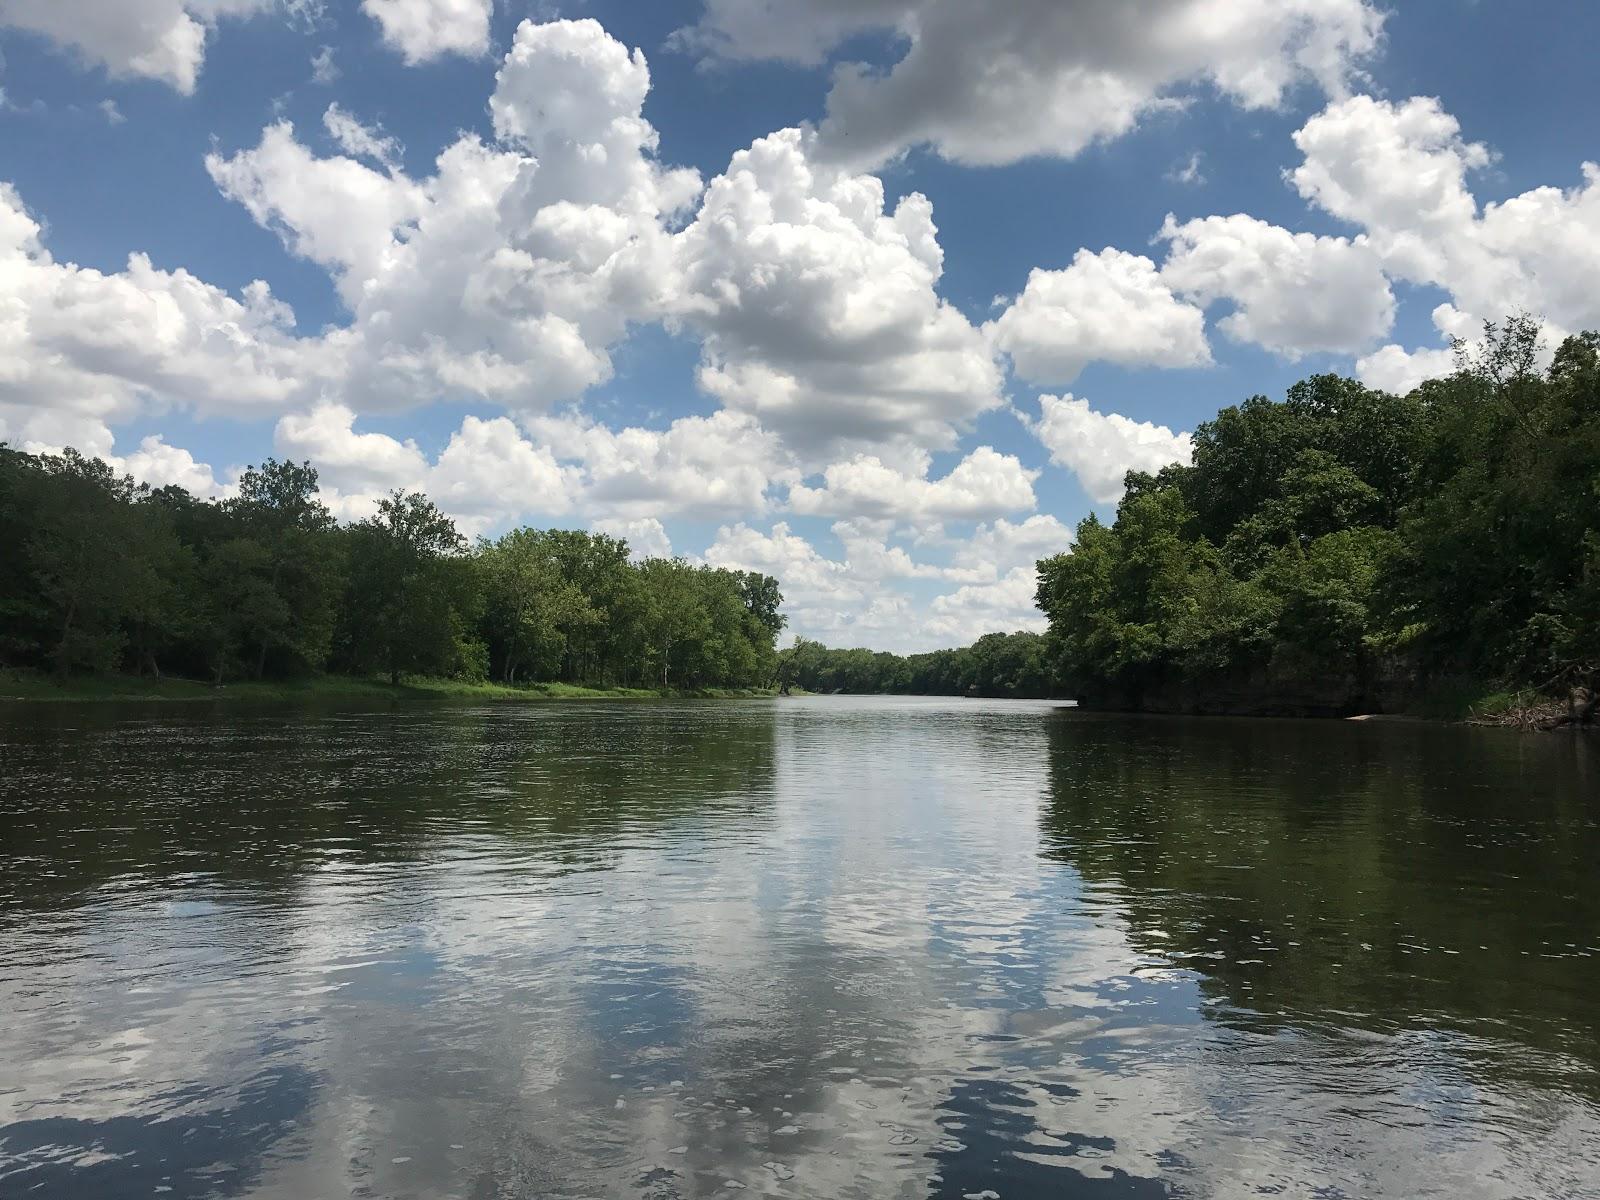 August Big River Fly Fishing - Big river